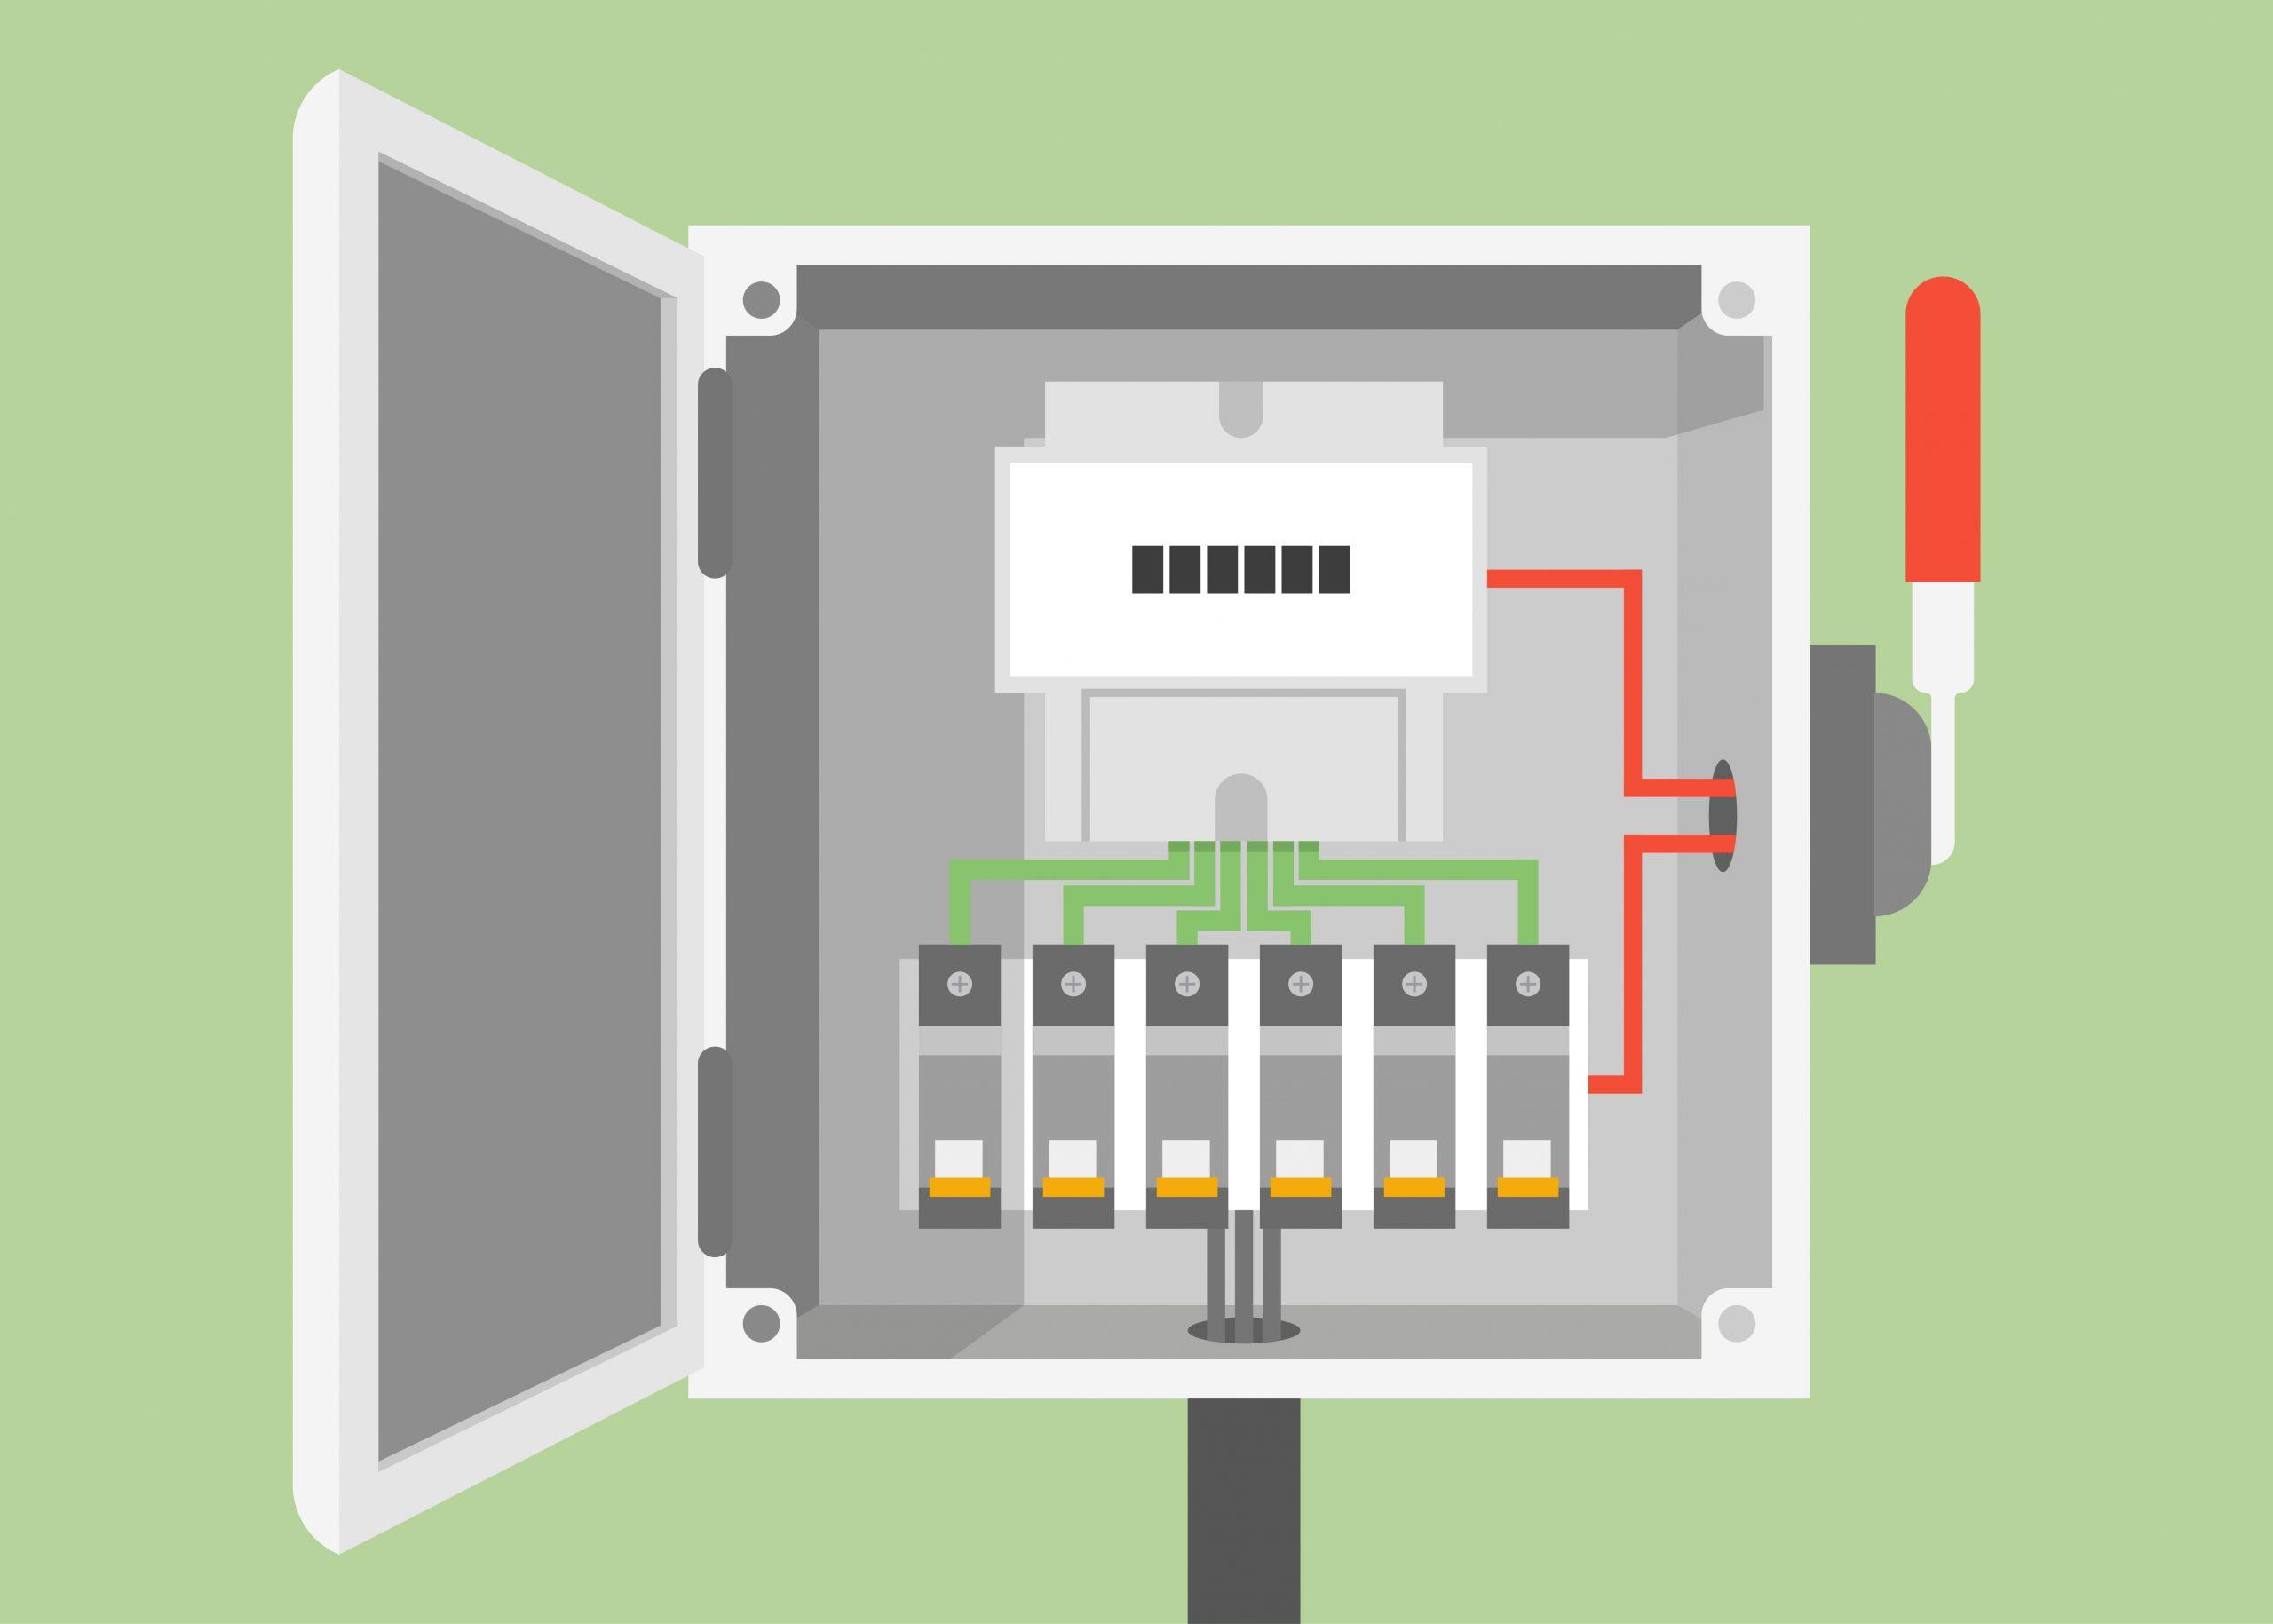 fuse box vs. circuit breaker